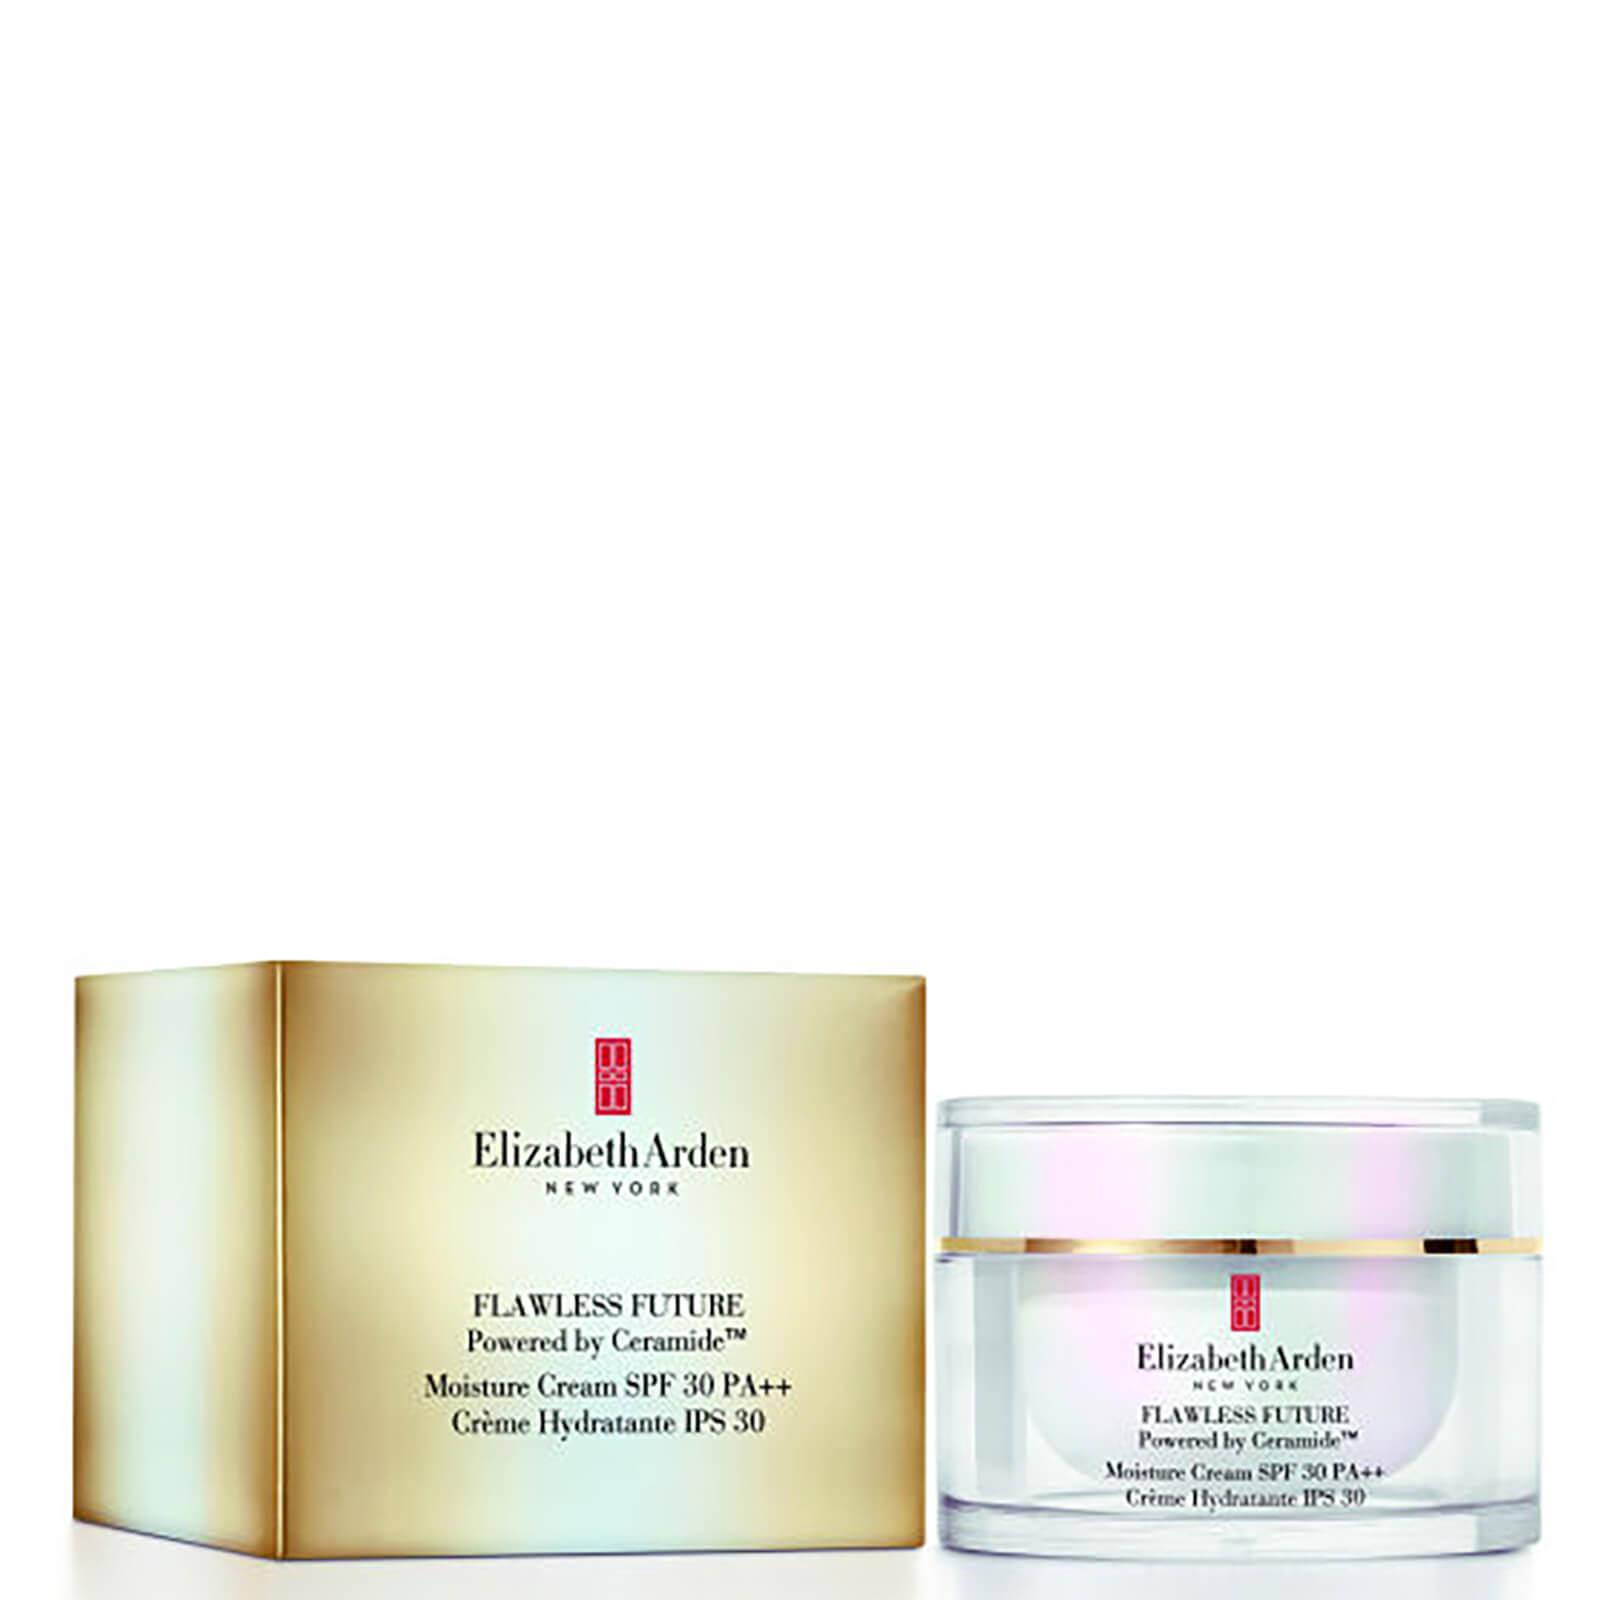 Elizabeth Arden Flawless Future Moisture Cream SPF30 PA++ Powered by Ceramide (50ml)